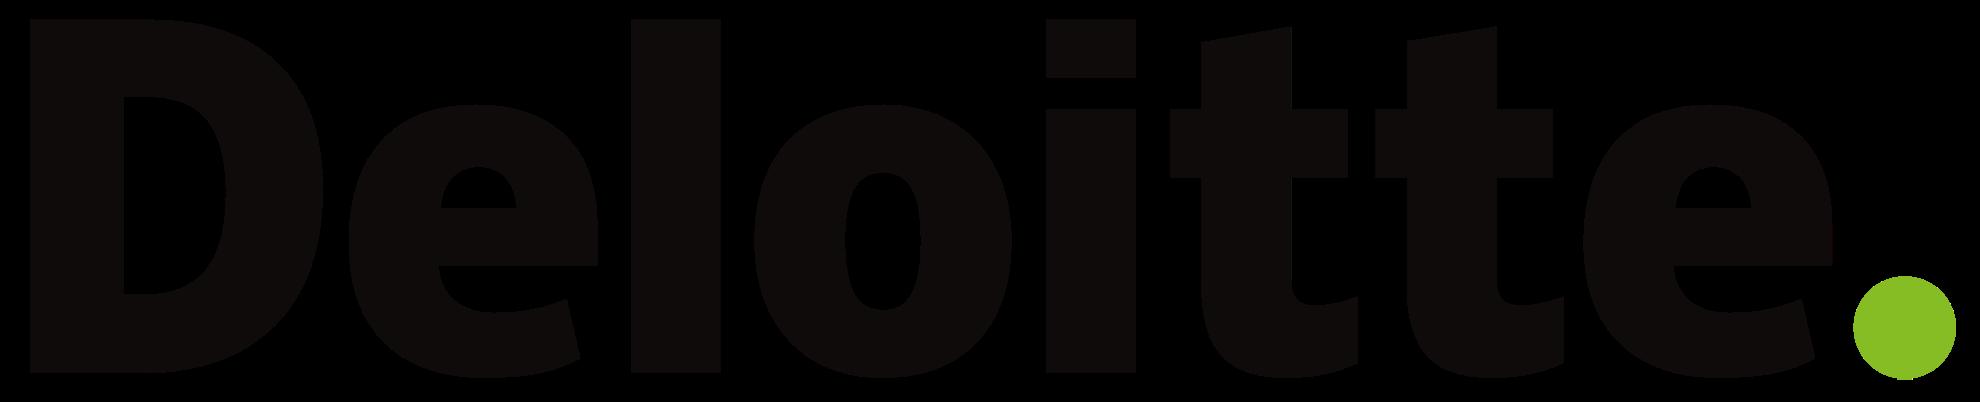 Deloitte, International Fraud Prevention Conference